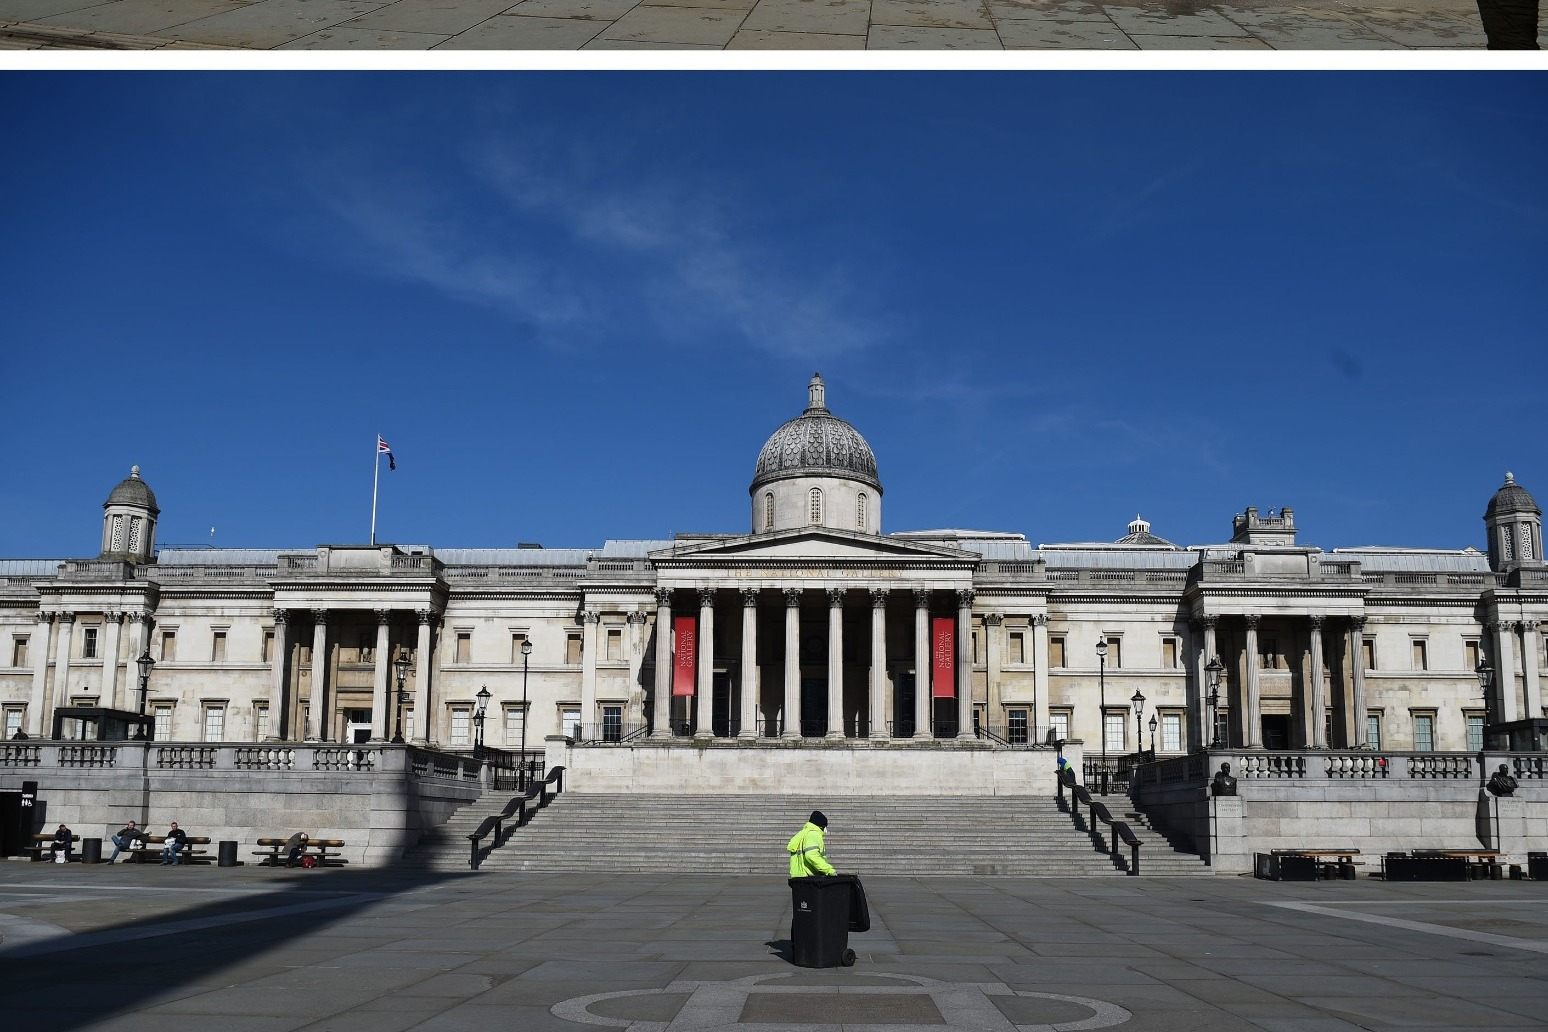 Famous landmarks deserted as coronavirus lockdown continues